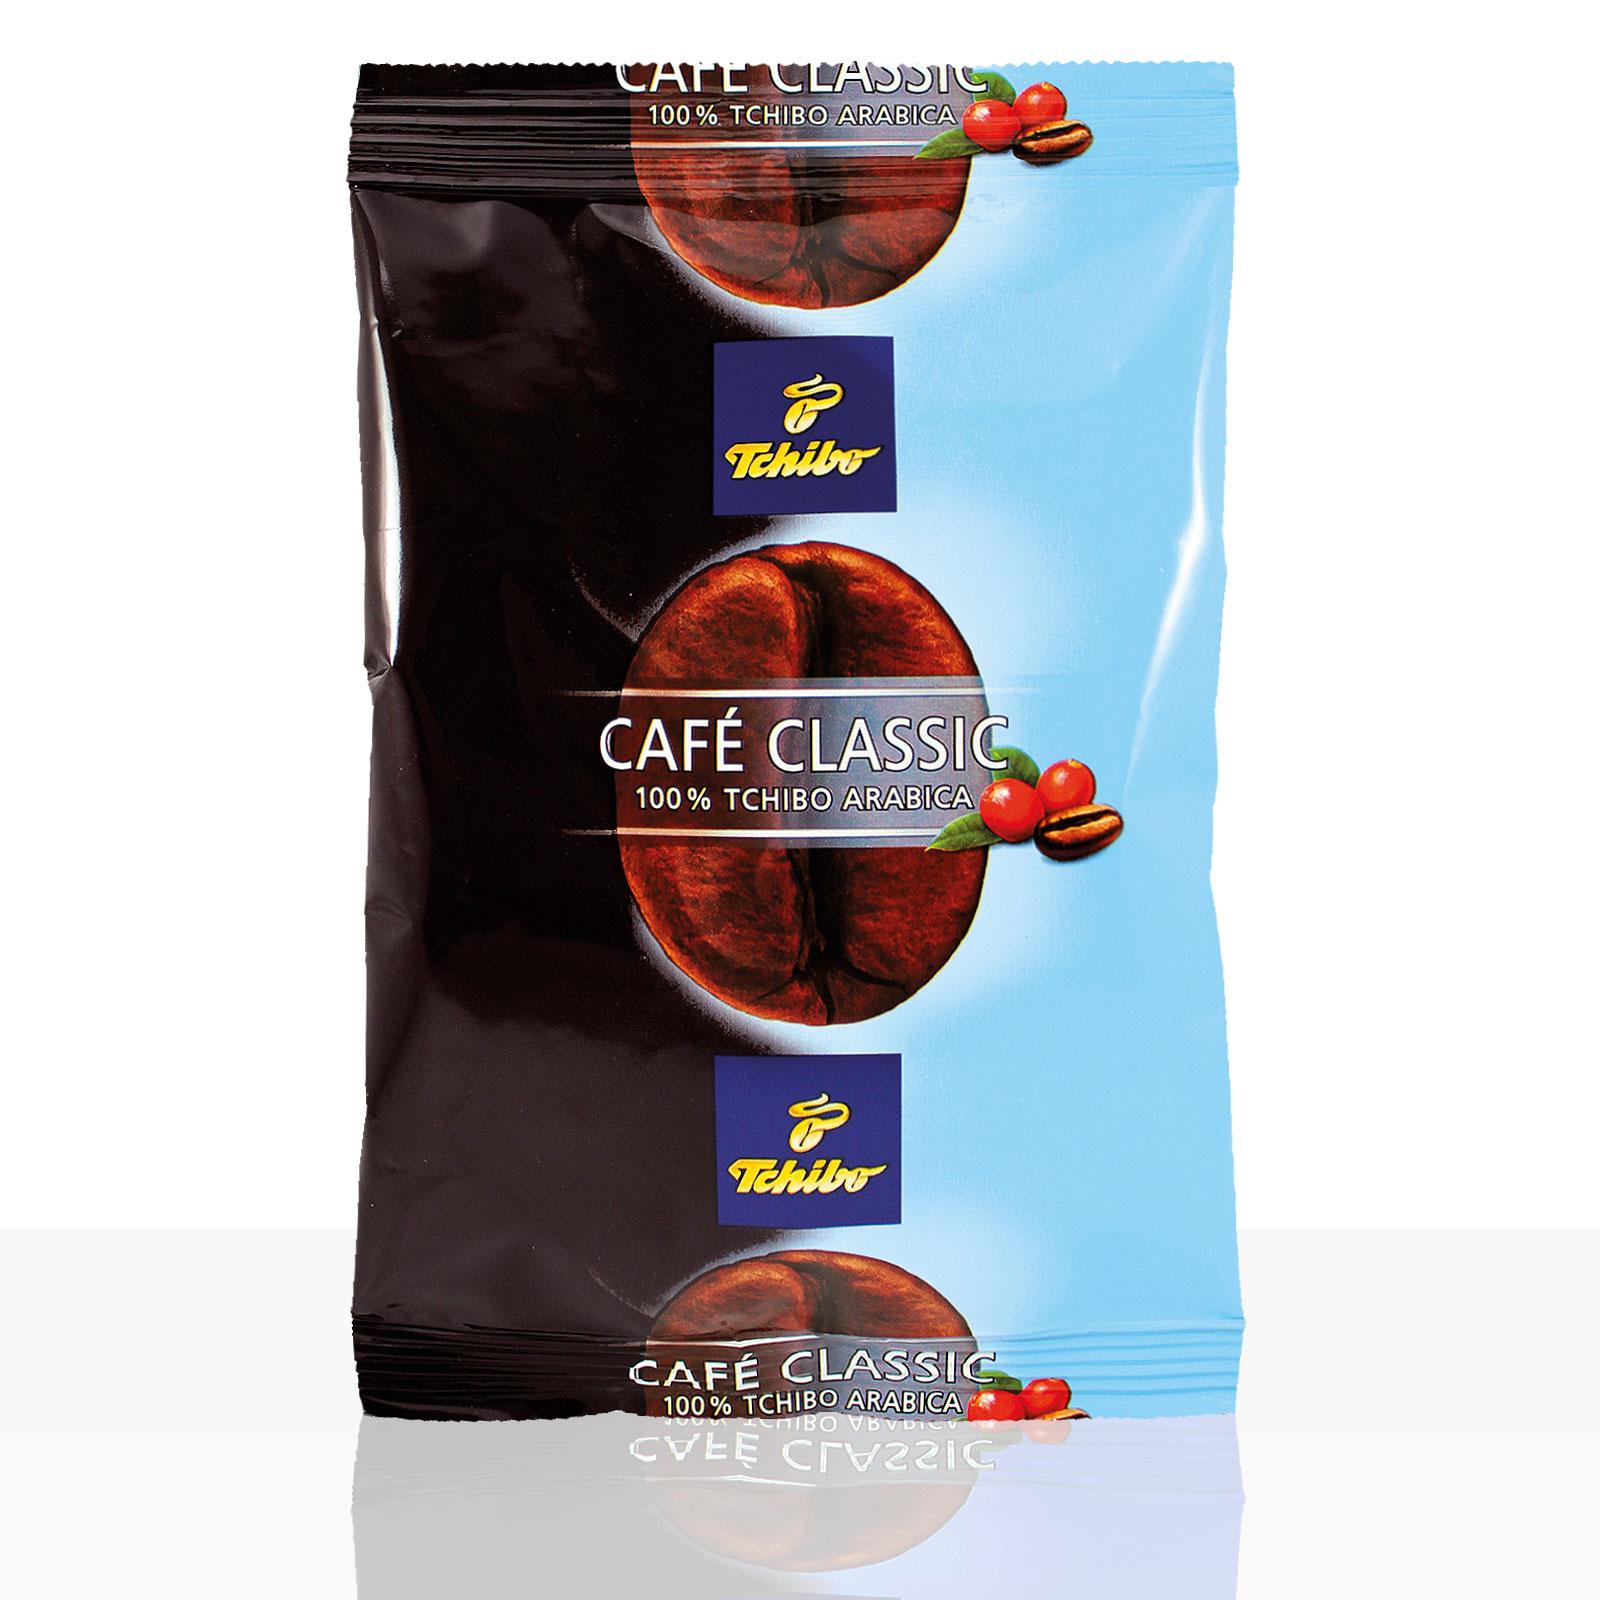 Tchibo Cafe Classic Mild HY 1 x 70g, Kaffee gemahlen portioniert